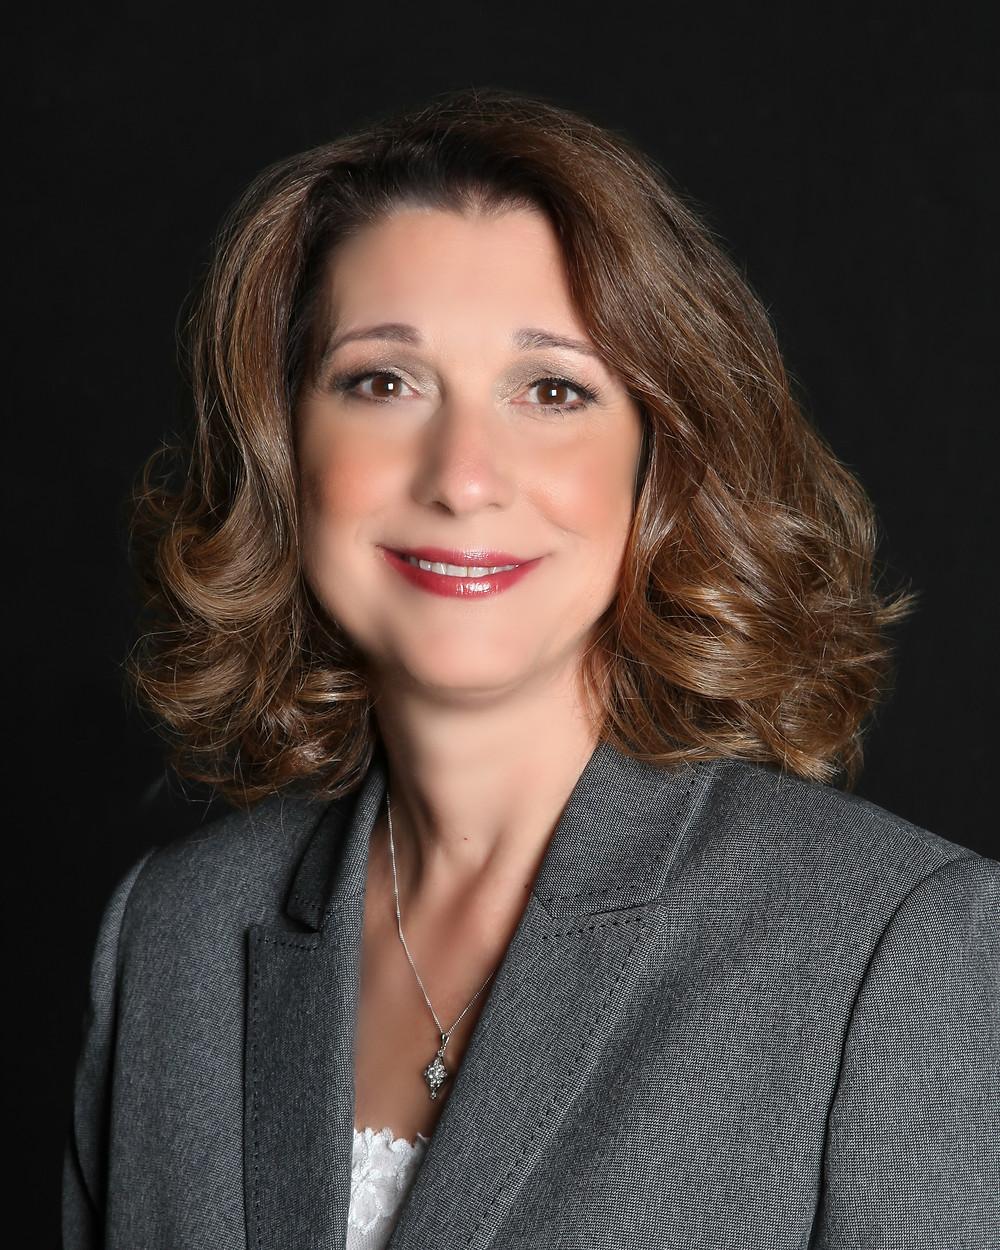 Portrait of Barbara Moran, BSN, MBA, Chief Nursing Officer at St. Vincent Charity Medical Center